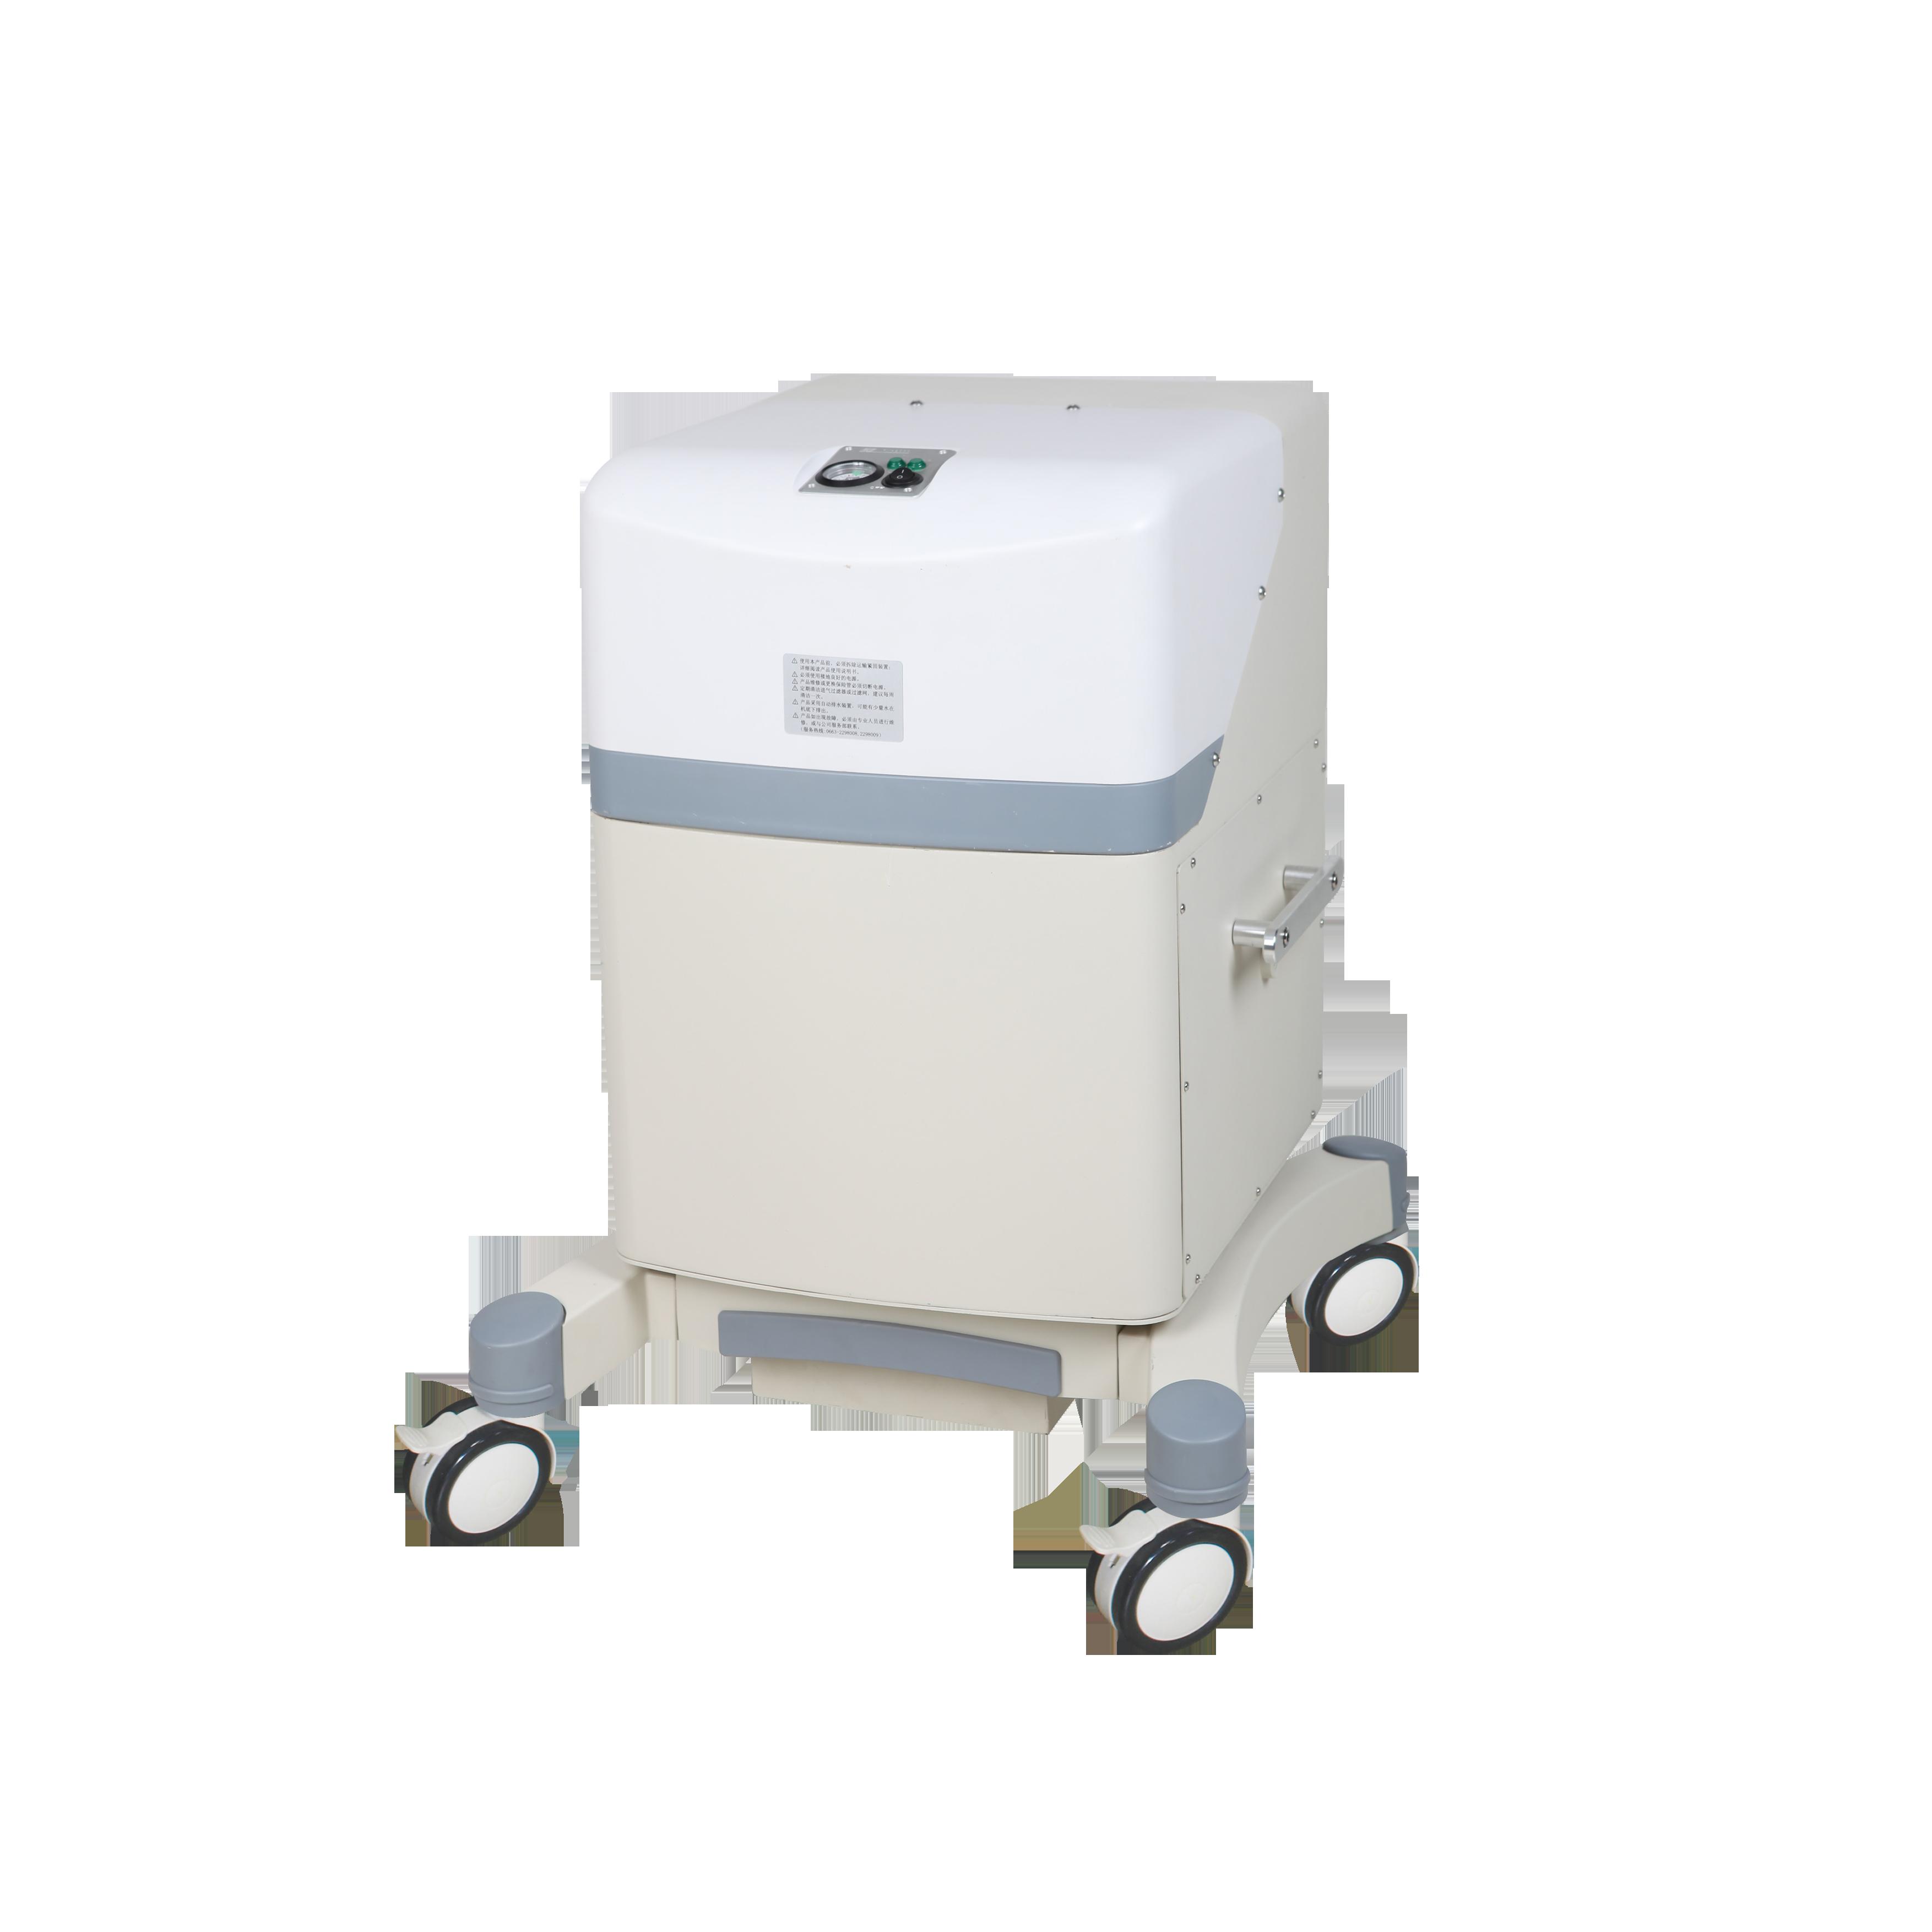 Portable High Flow China Manufacture Medical Air Compressor for ICU Ventilators - KingCare | KingCare.net